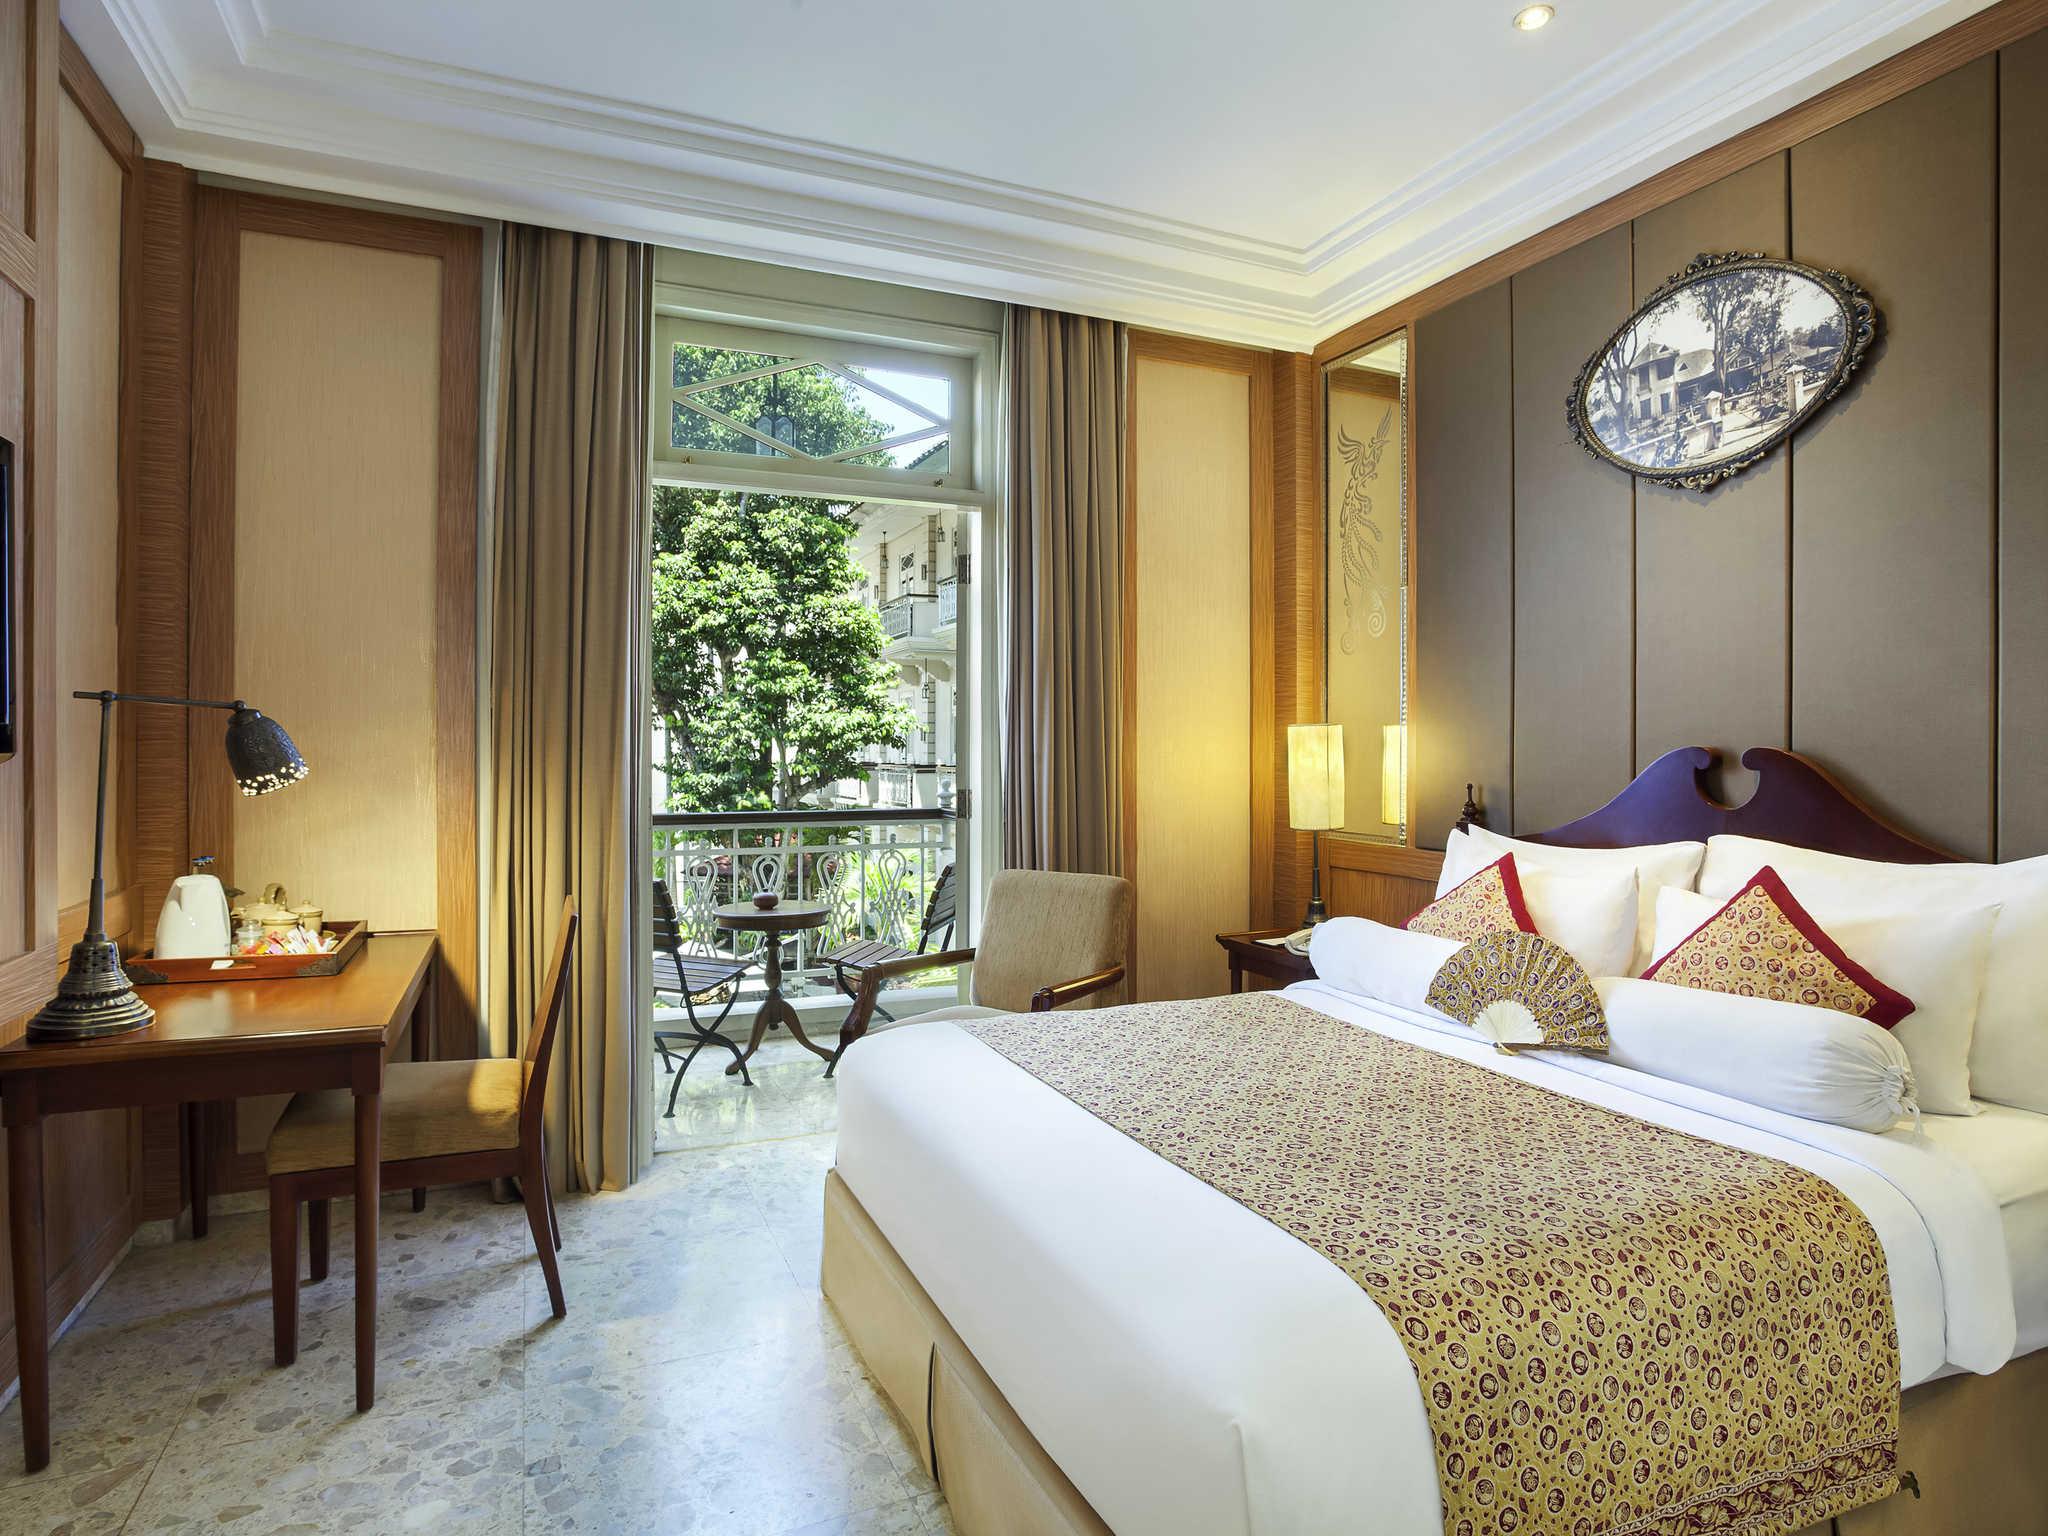 5-star hotel in Yogyakarta - The Phoenix Hotel - Accorhotels